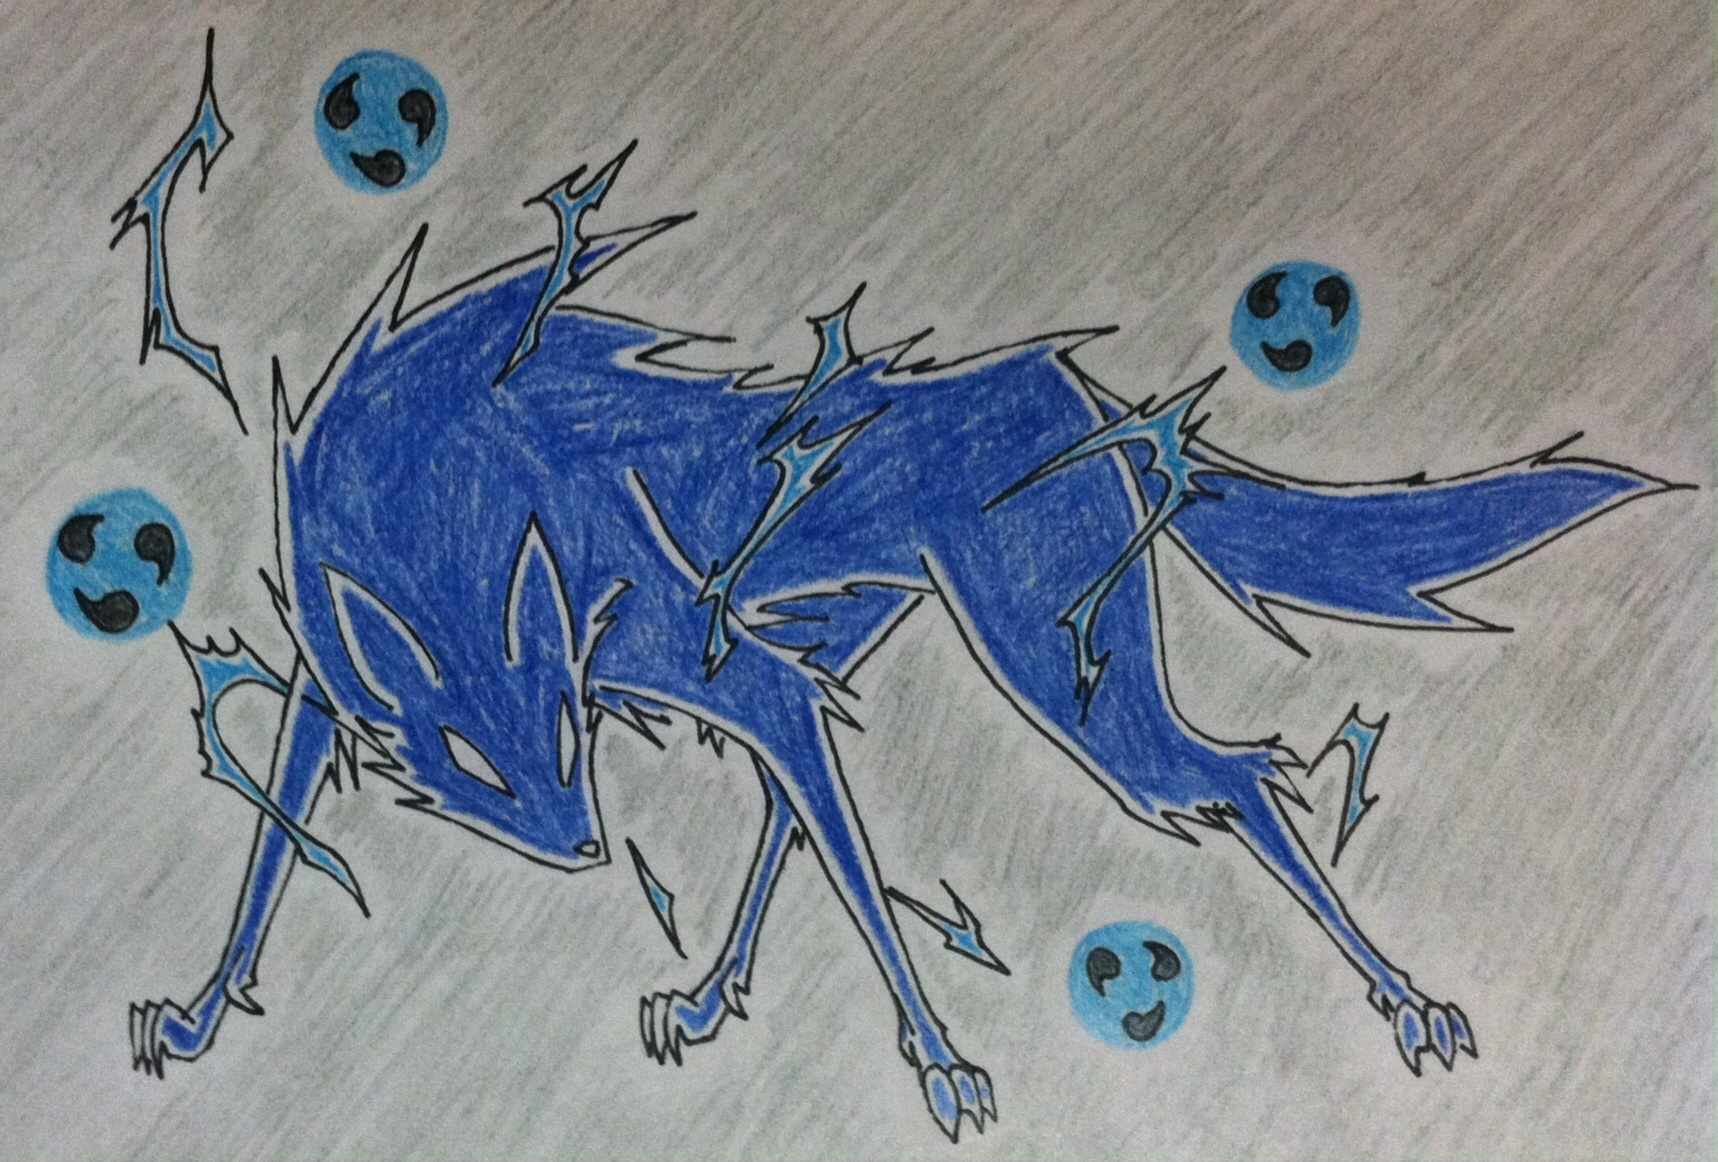 Raiju By Devilwolf9 On Newgrounds It flies like a ball of thunder and its cry sounds like thunder. raiju by devilwolf9 on newgrounds